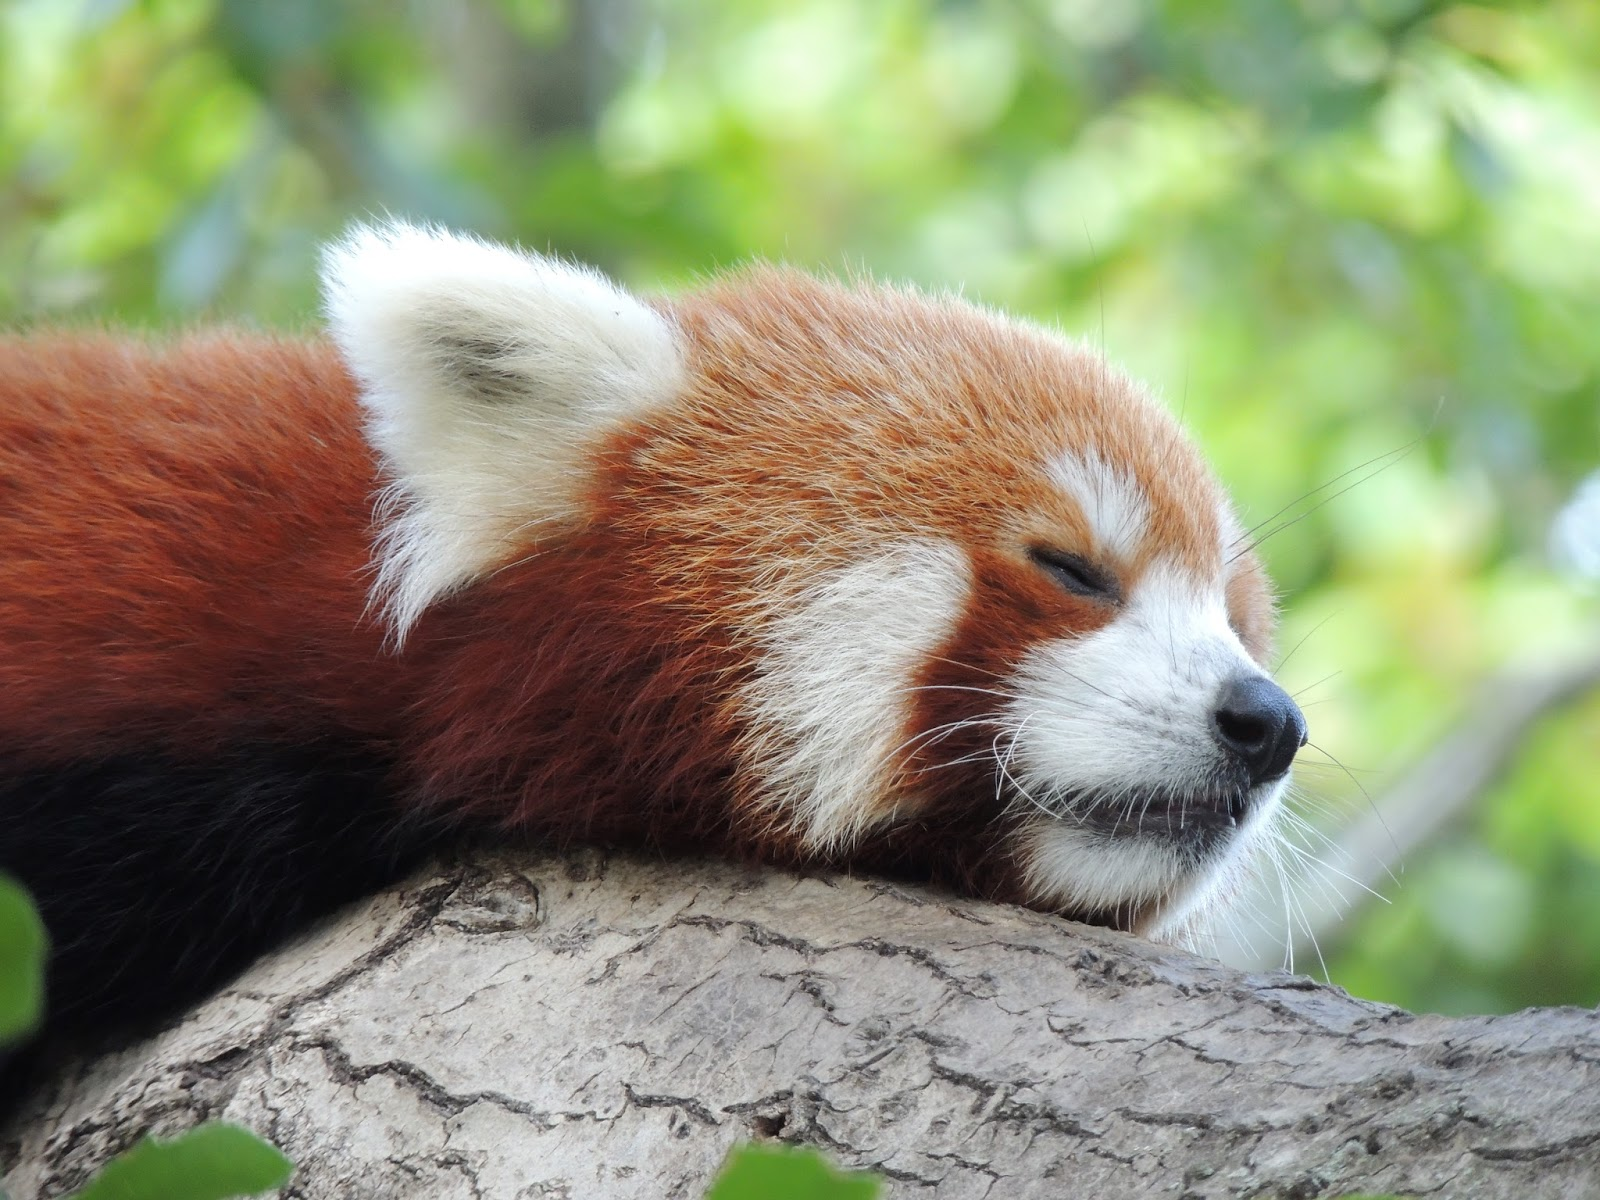 panda animal pandas skyenimals animals bear wallpapers sleeping redpanda type fossil heard information info hd cat